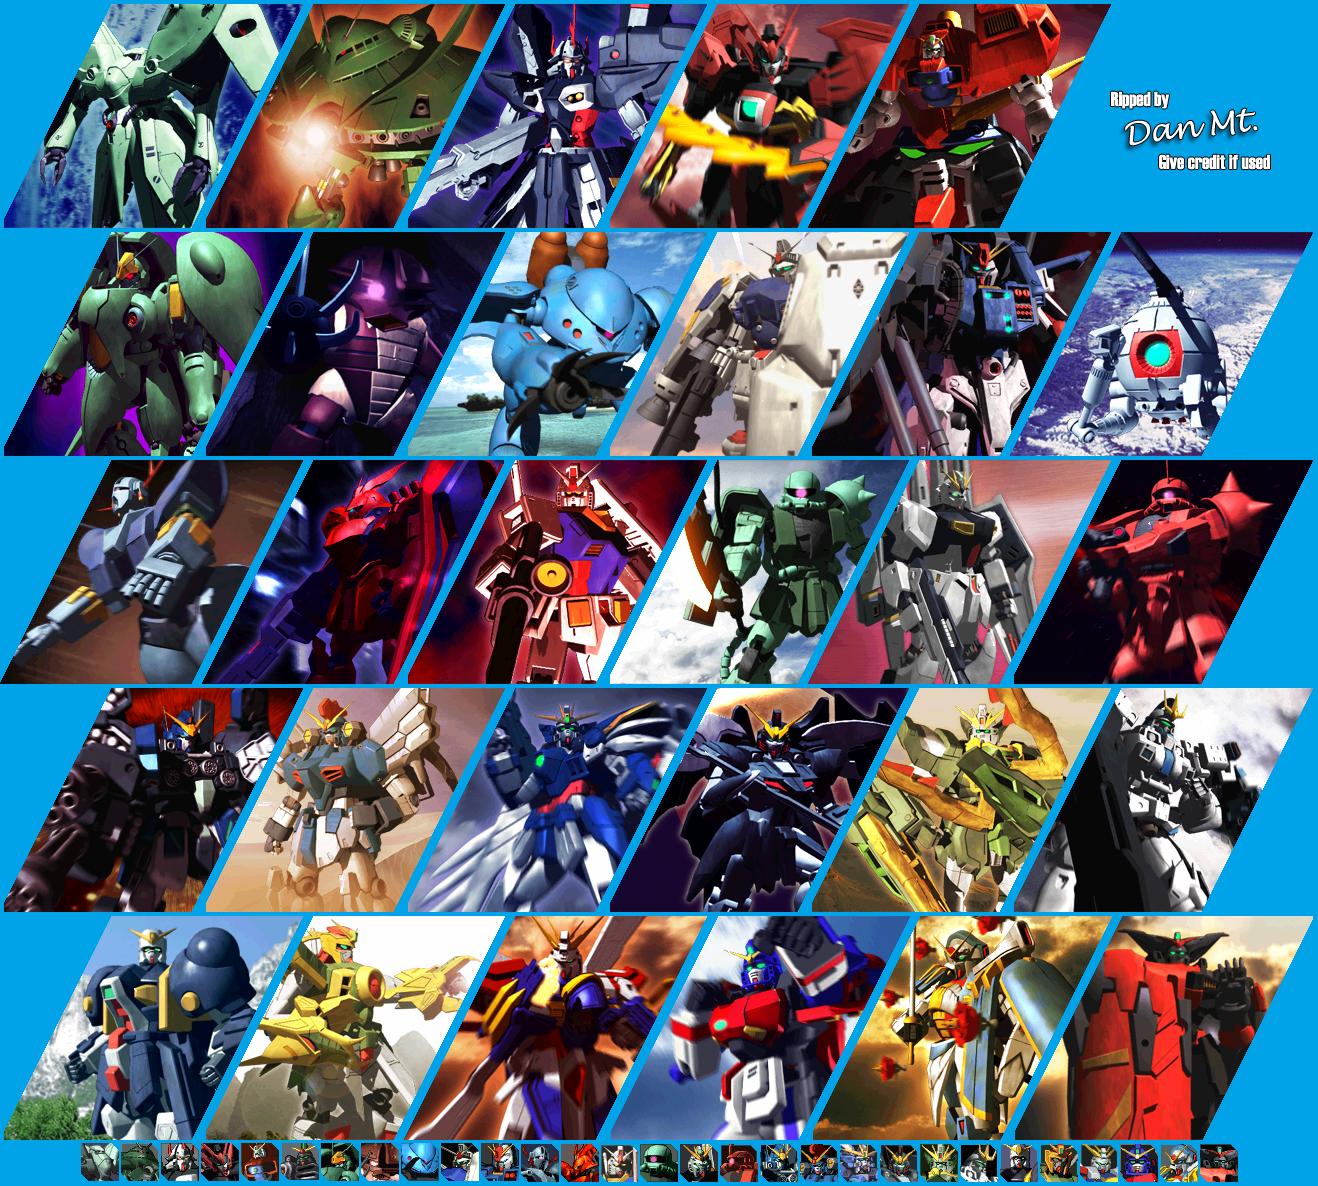 [Análise Retro Game] - Gundam Battle Assault 2 - Playstation One MobileSuitPortraits